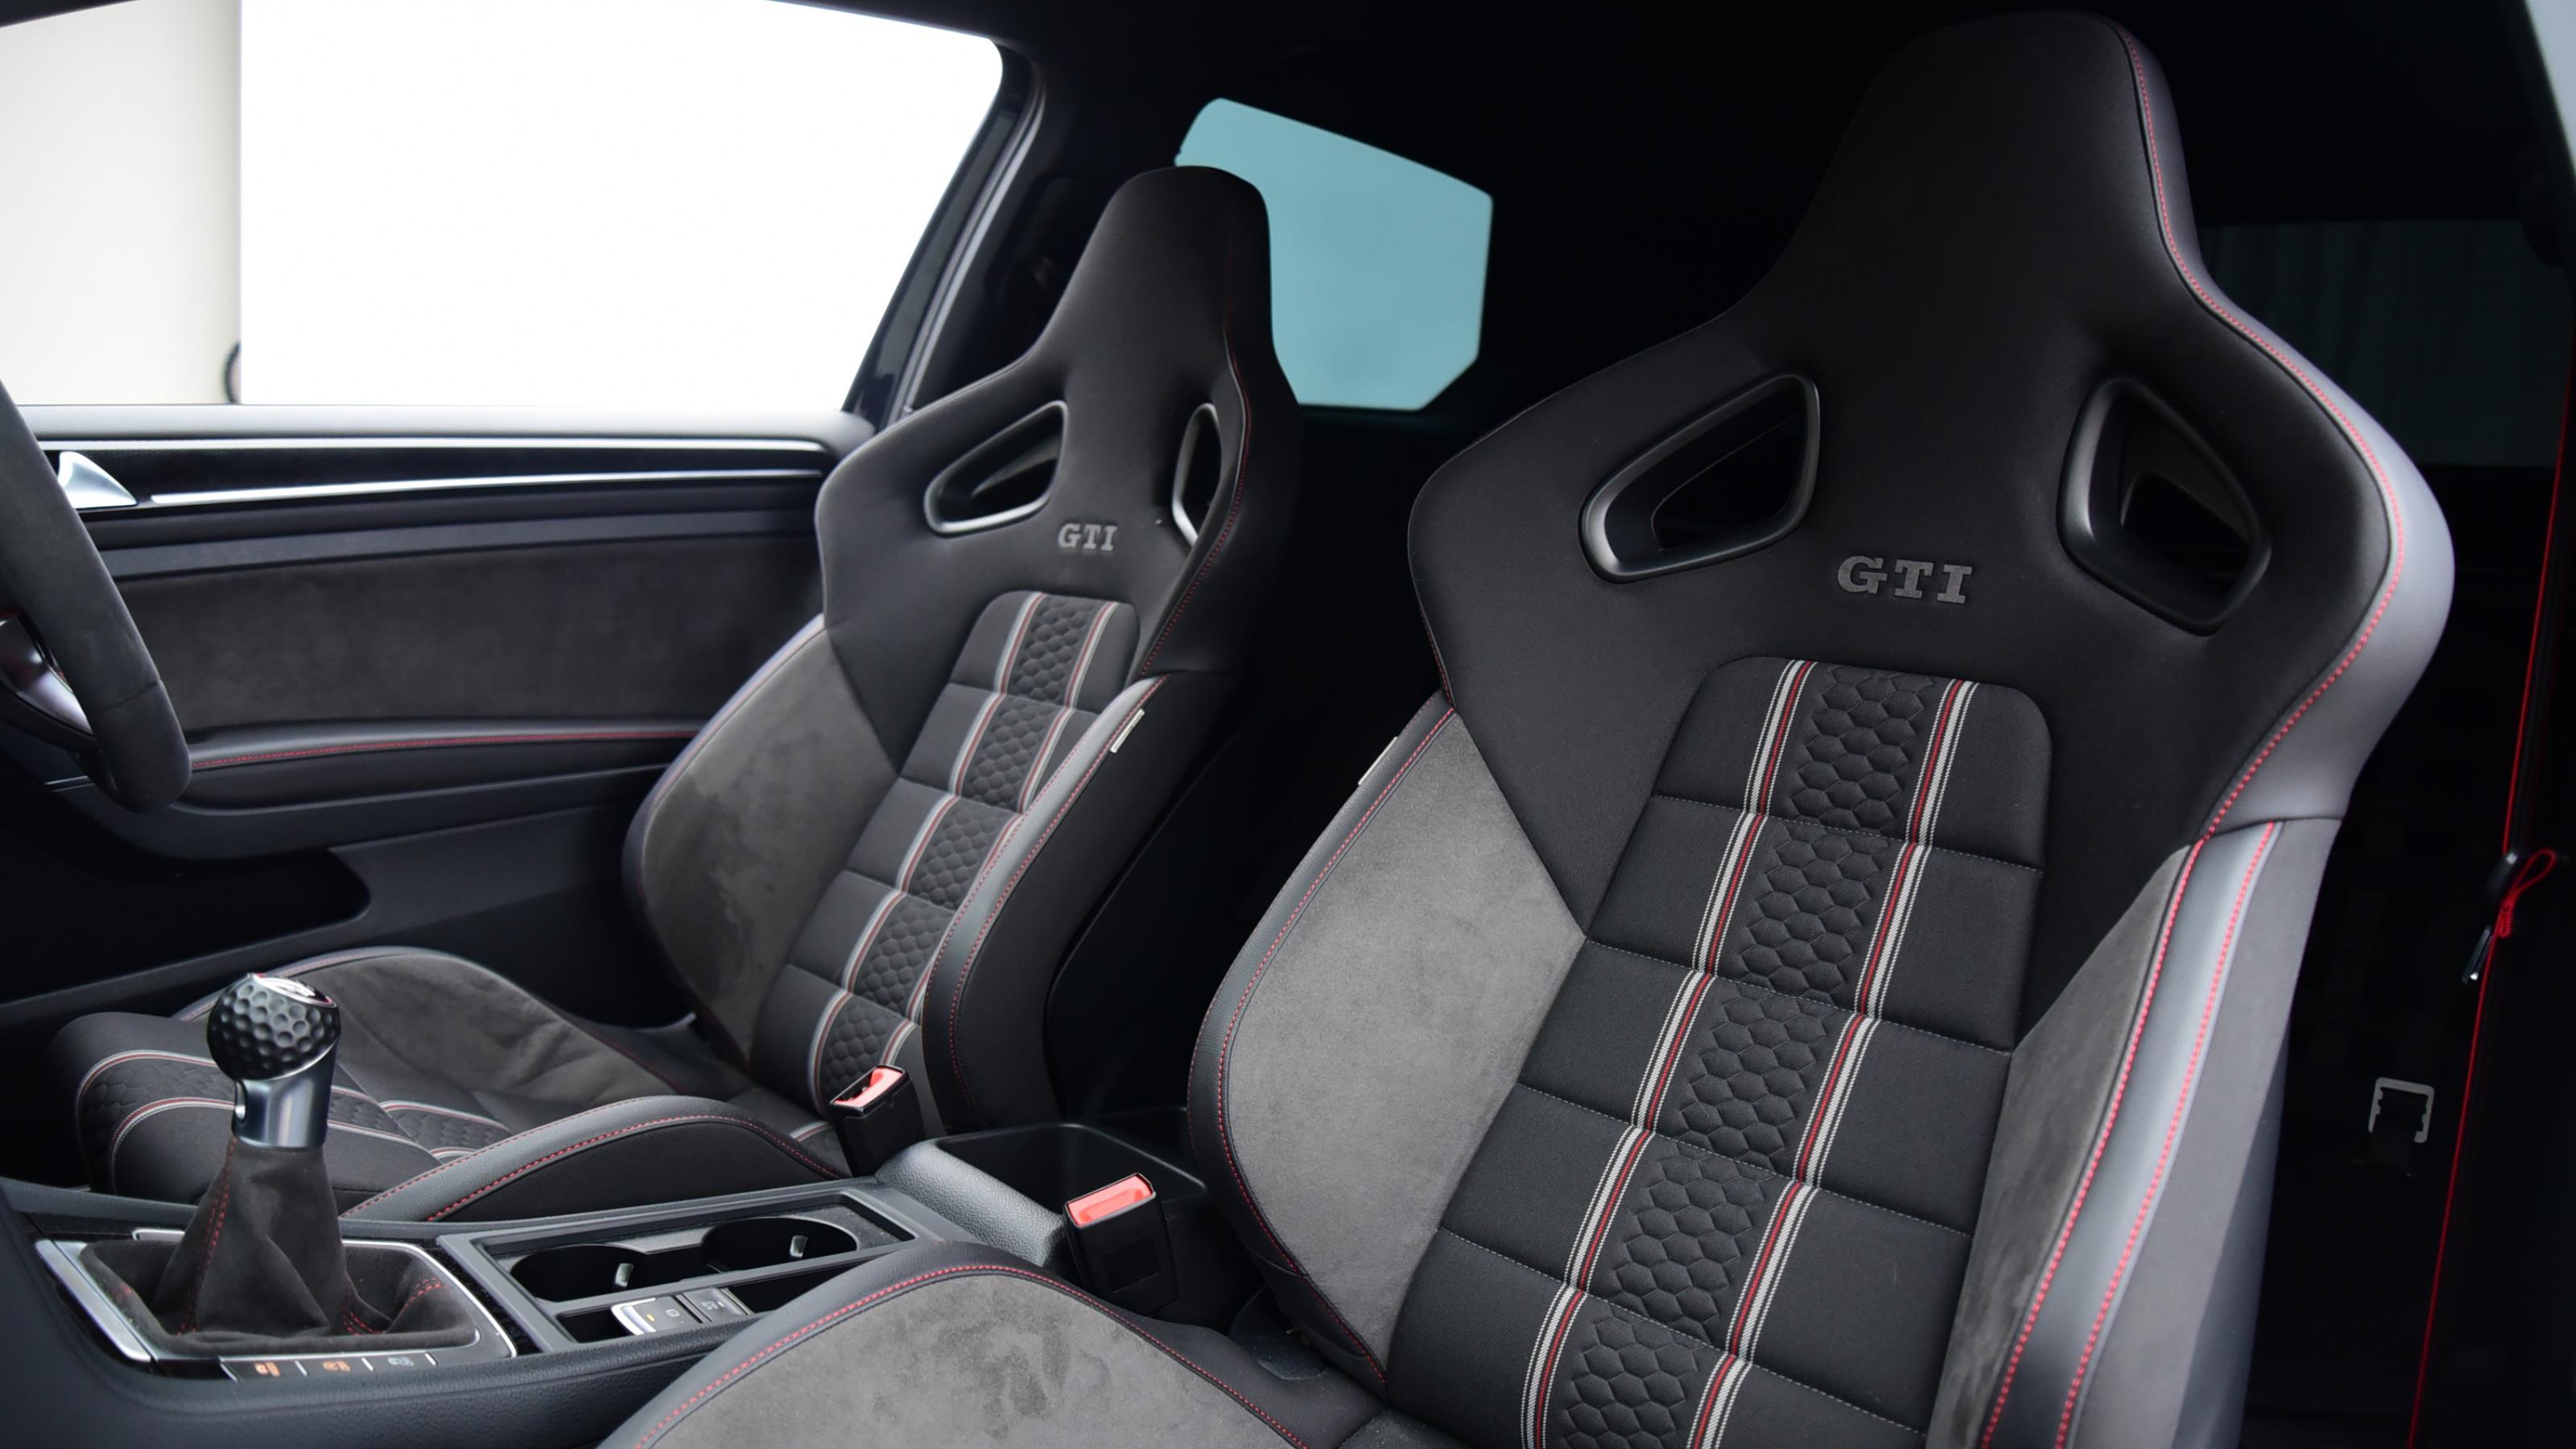 Used 16 Volkswagen GOLF 2.0 TSI GTI Clubsport S 3dr BLACK at Saxton4x4